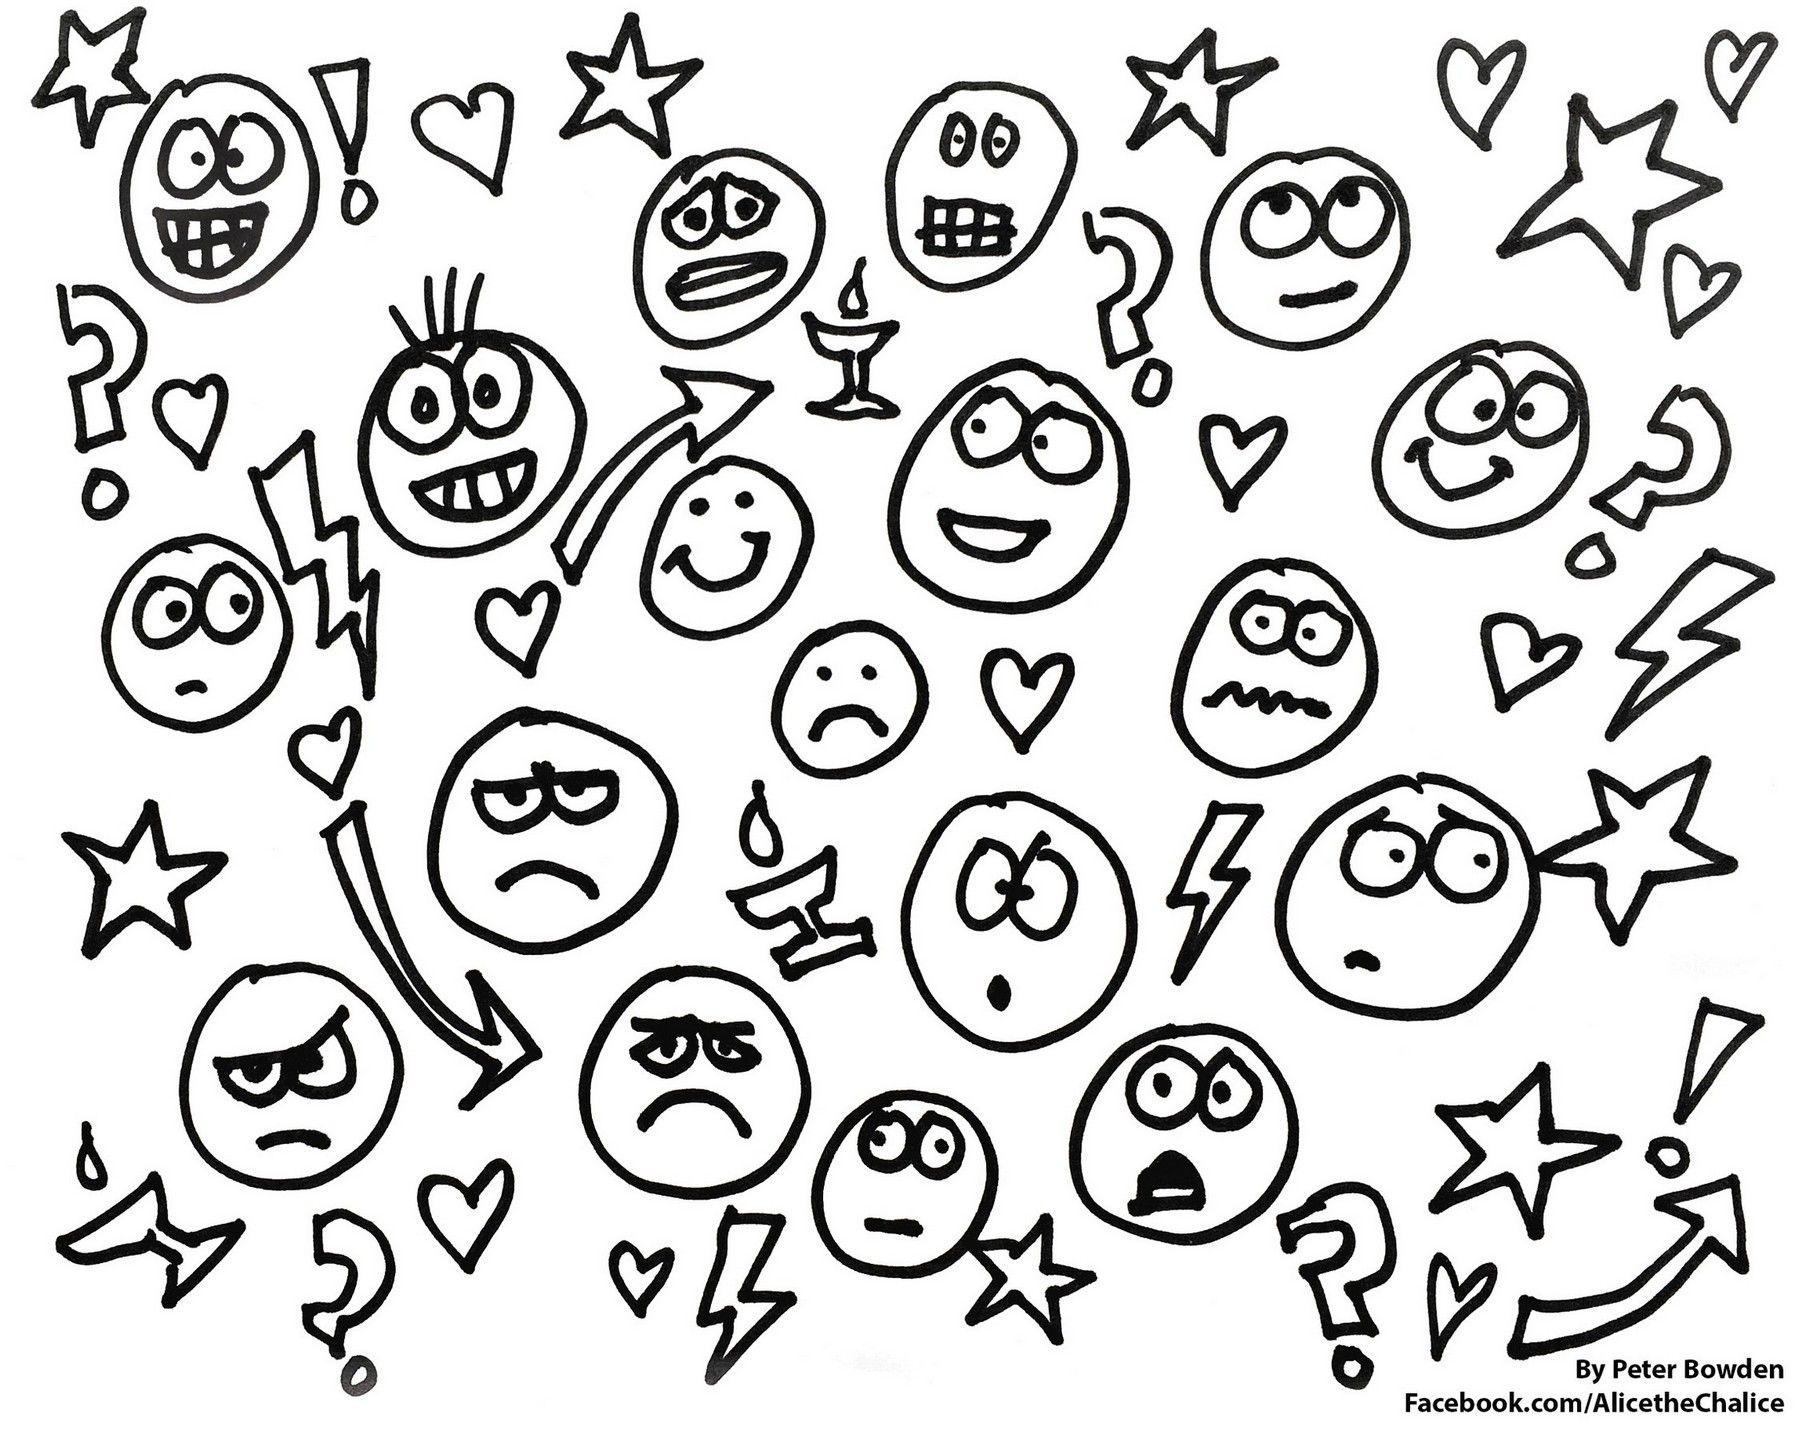 Coloring Page Emojis Hd Coloring Board Pinterest Emojis